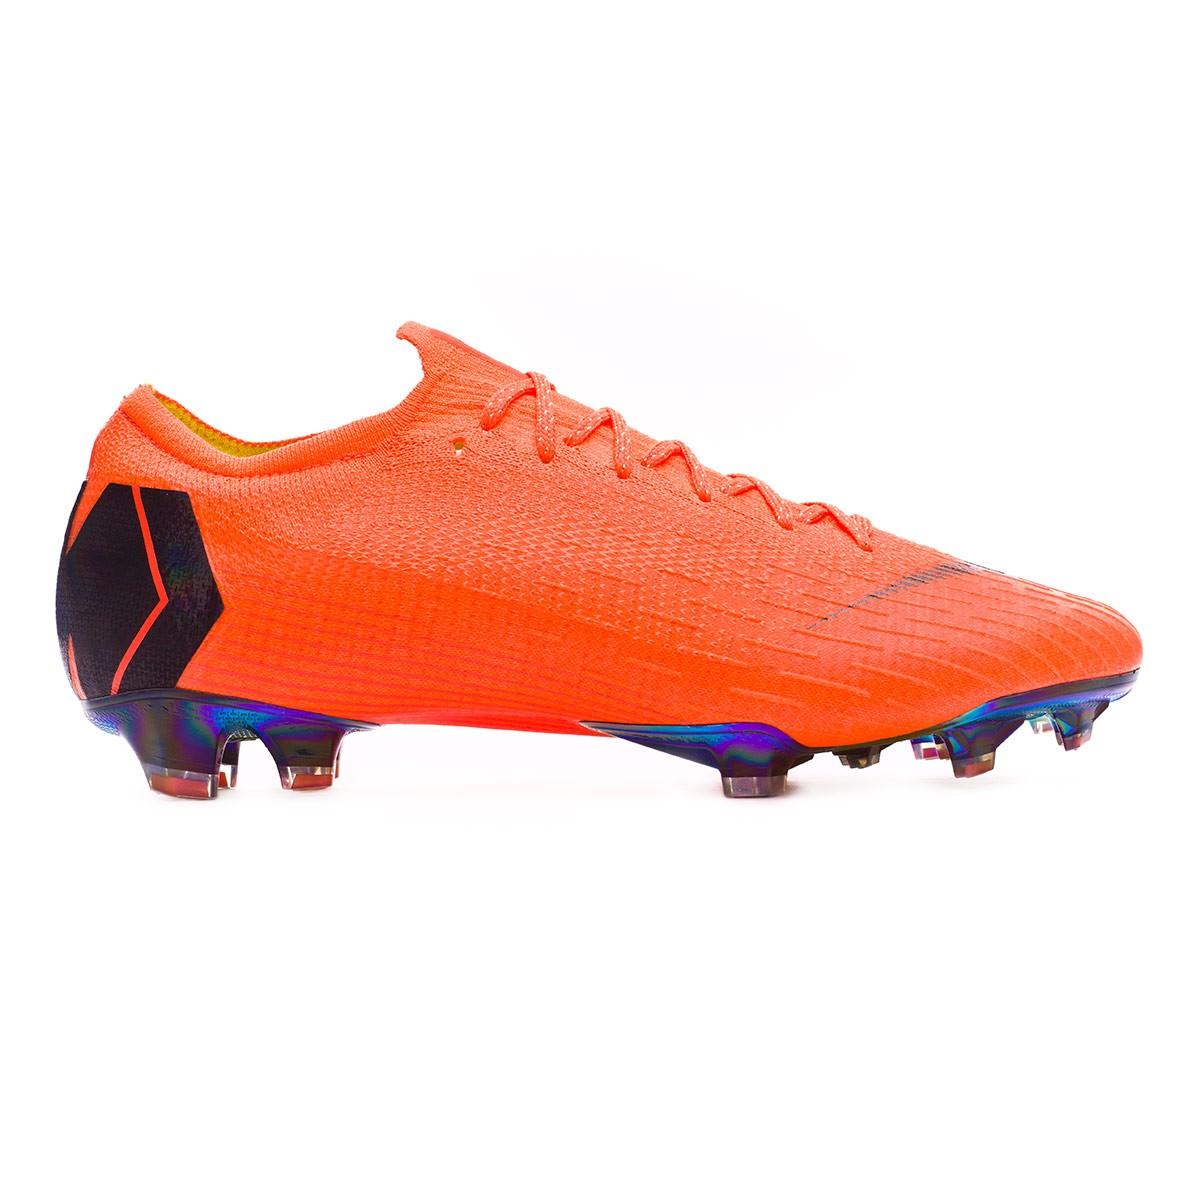 905a5bcb02 Bota de fútbol Nike Mercurial Vapor XII Elite FG Total orange-Black-Volt -  Tienda de fútbol Fútbol Emotion